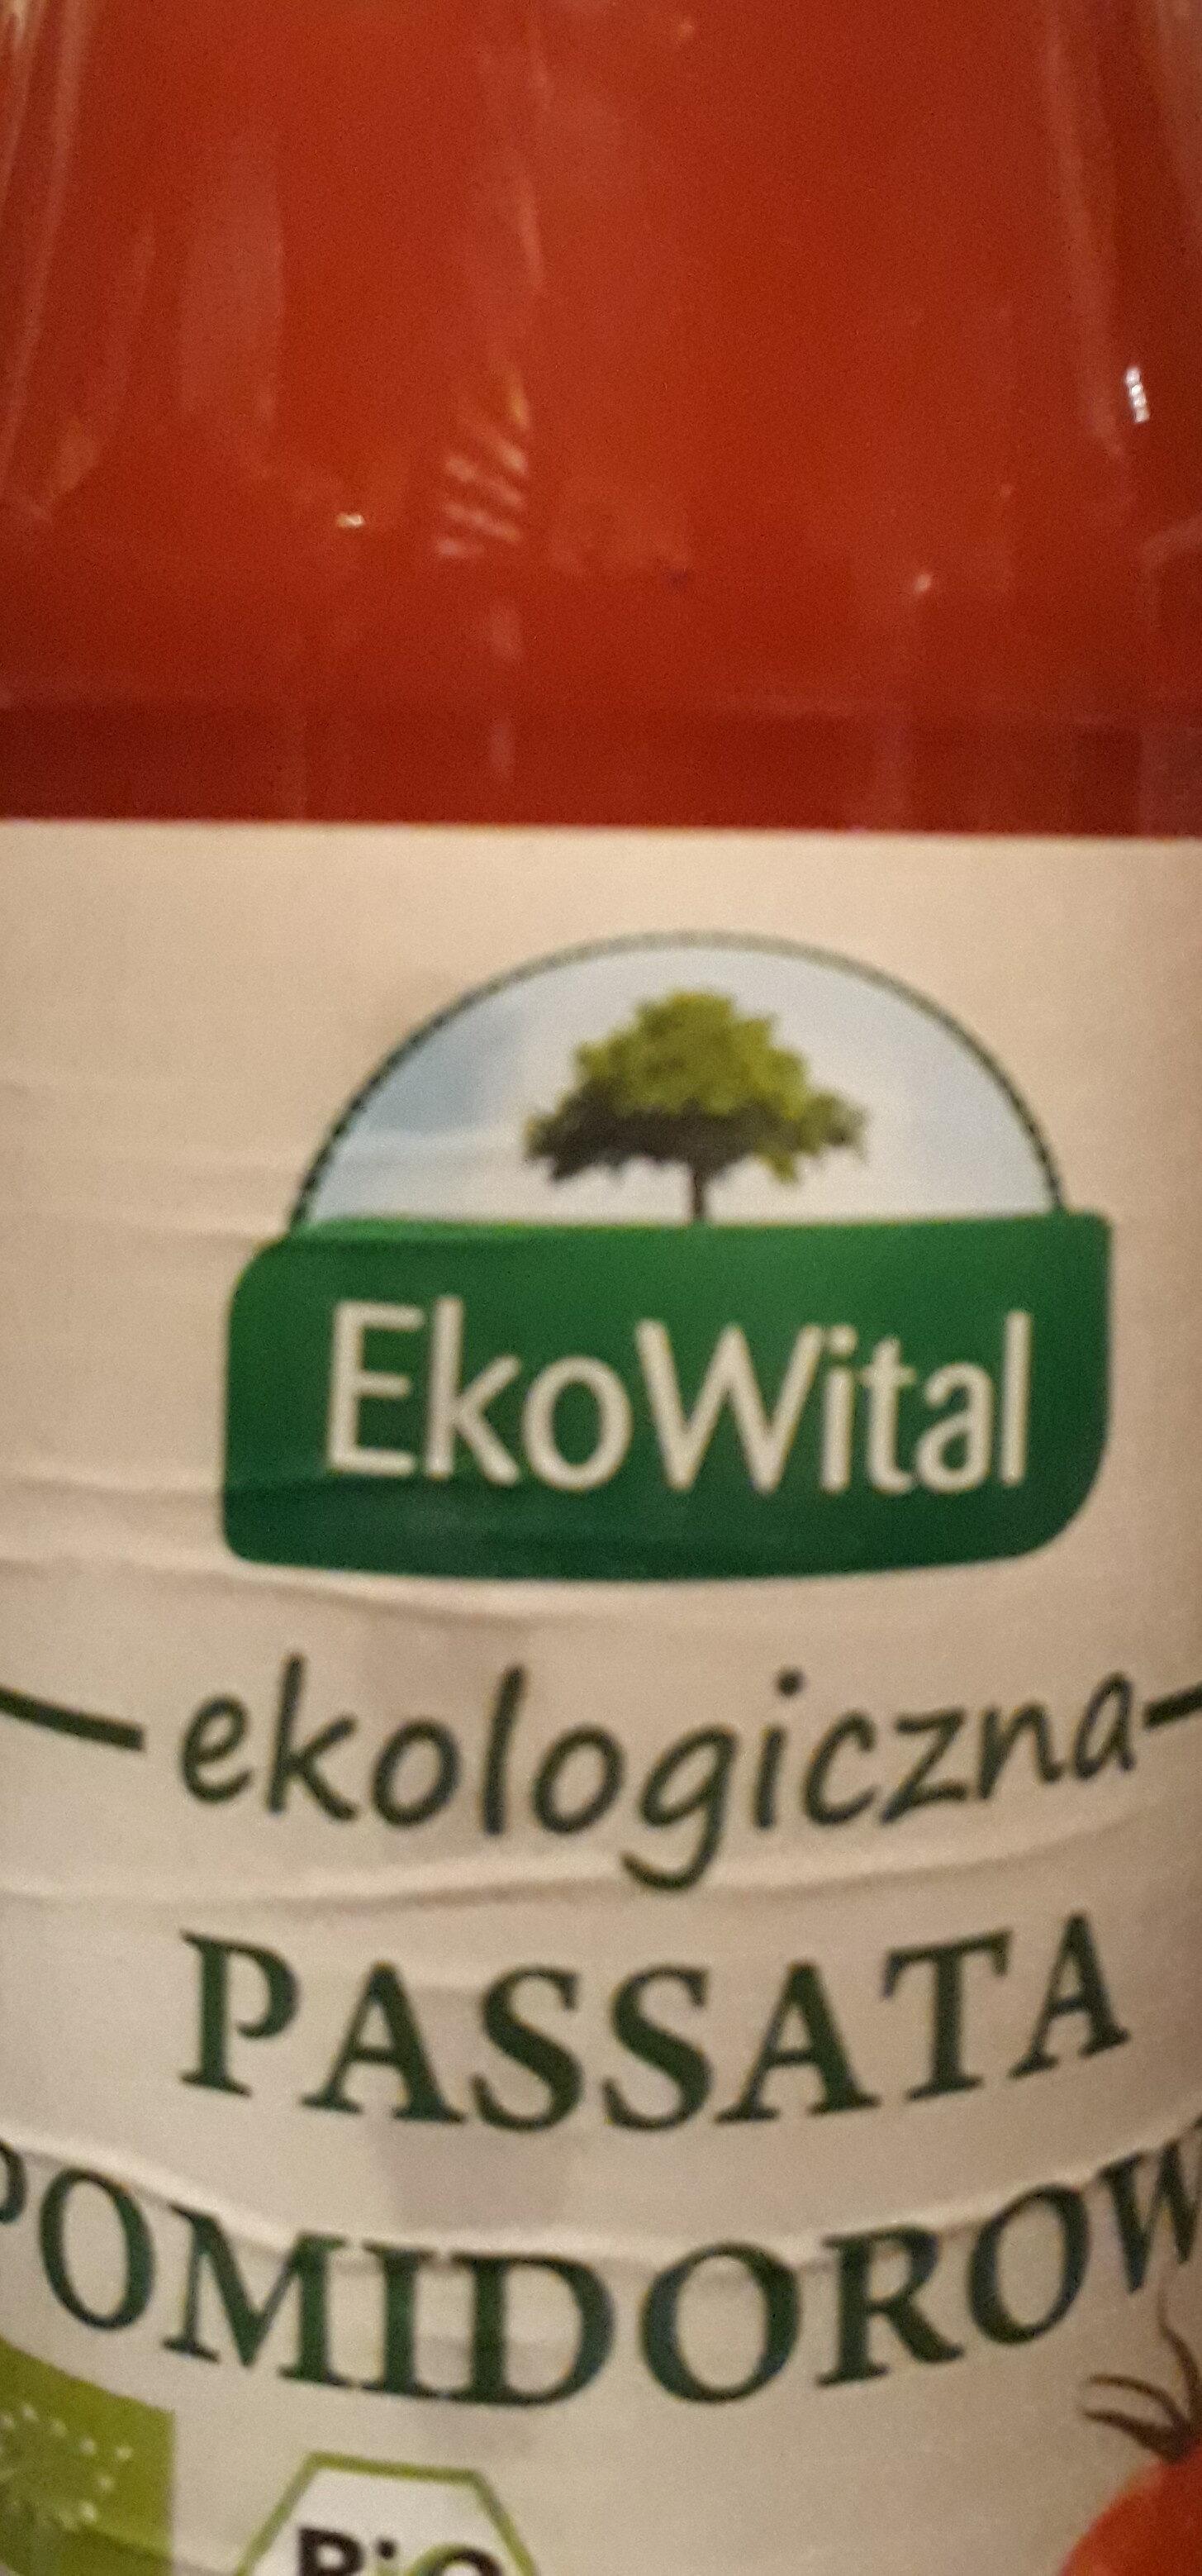 Passata pomidorowa - Produkt - pl